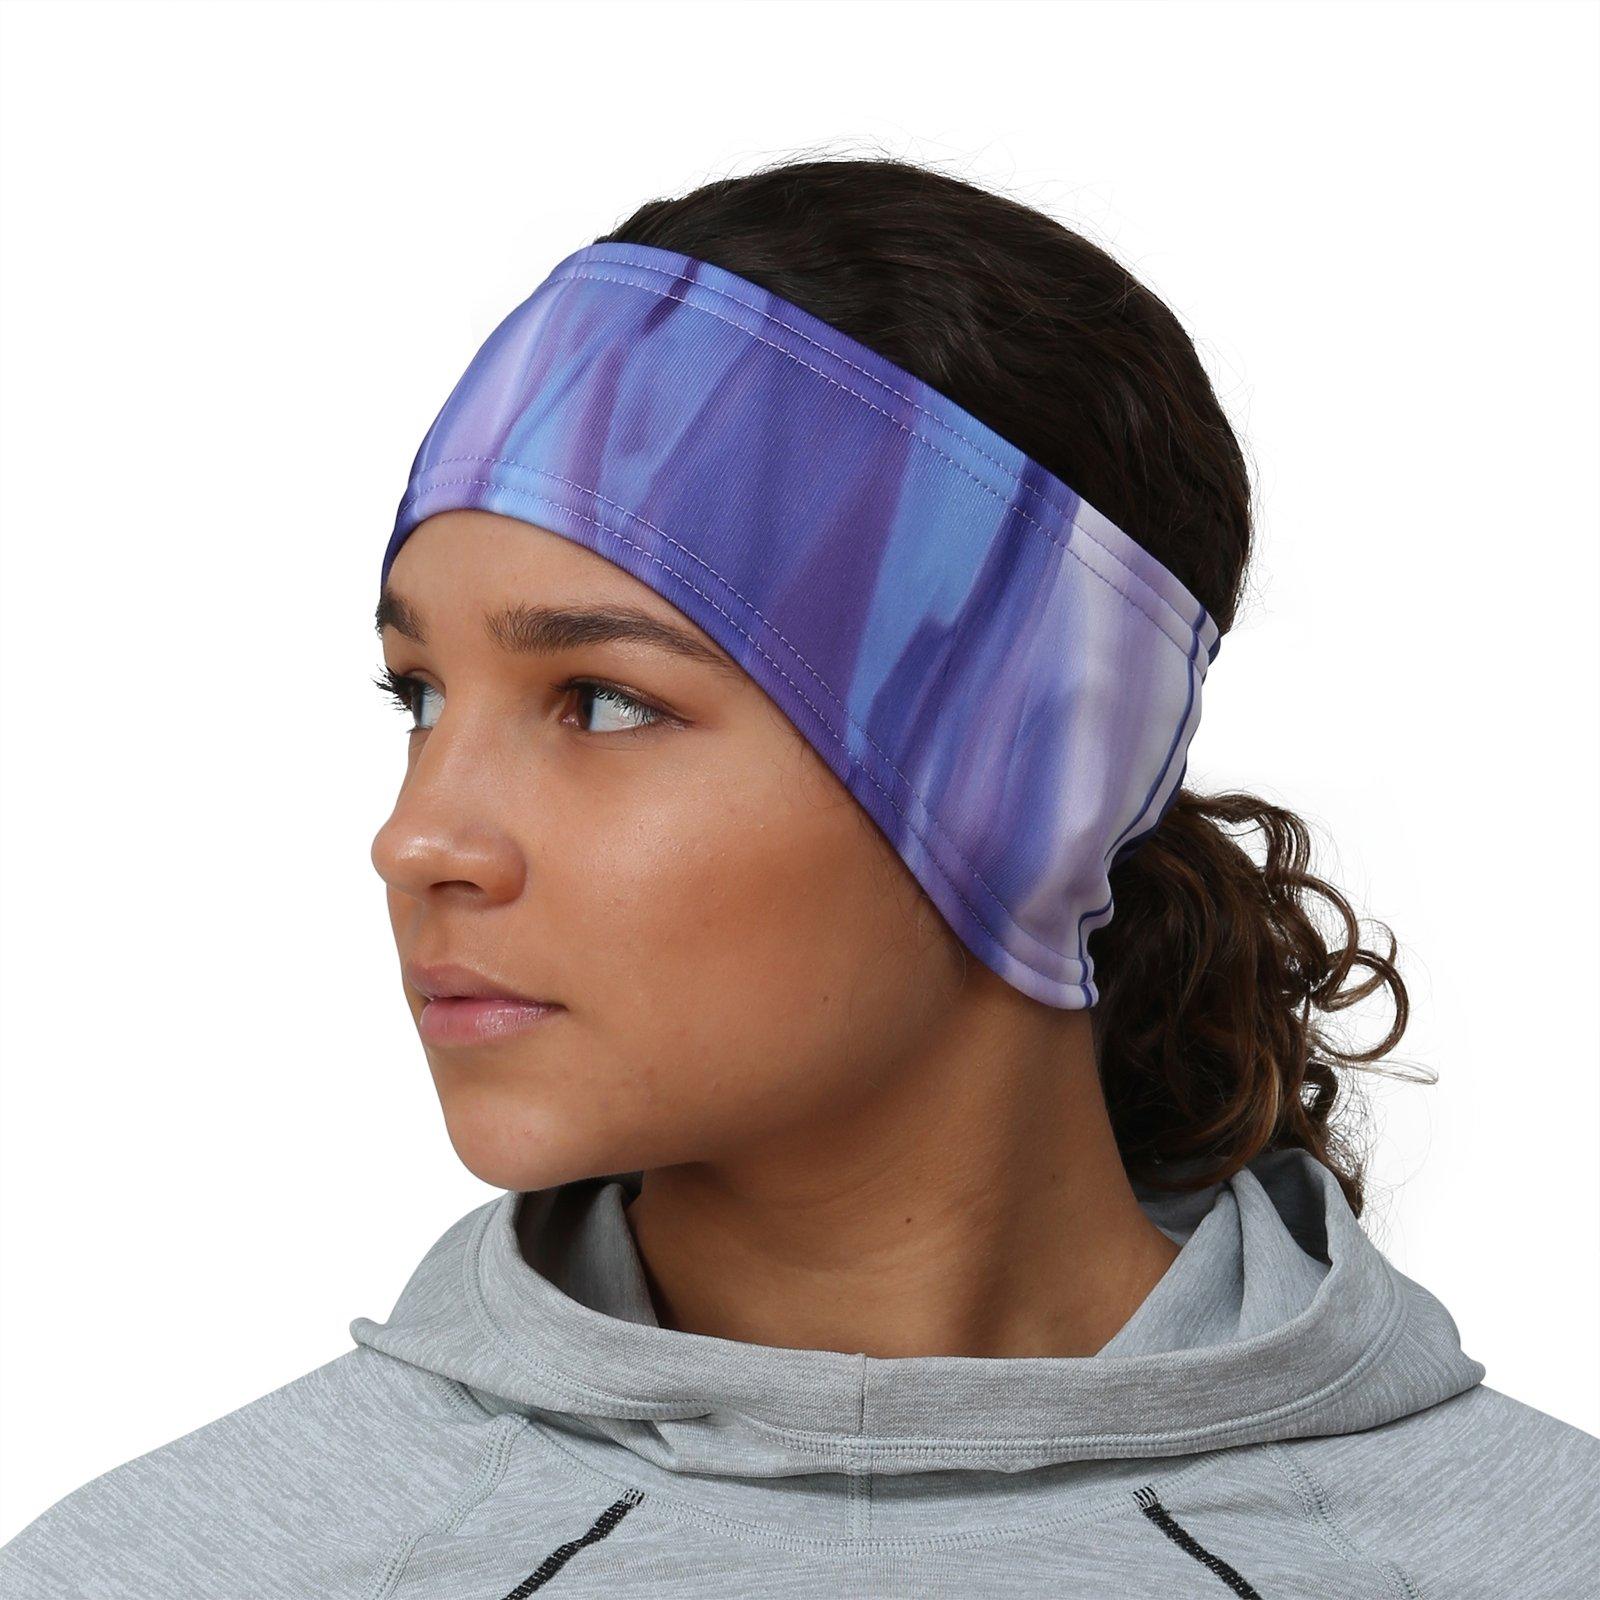 TrailHeads Women's Print Ponytail Headband – 12 prints - Made in USA - purple waves by TrailHeads (Image #1)